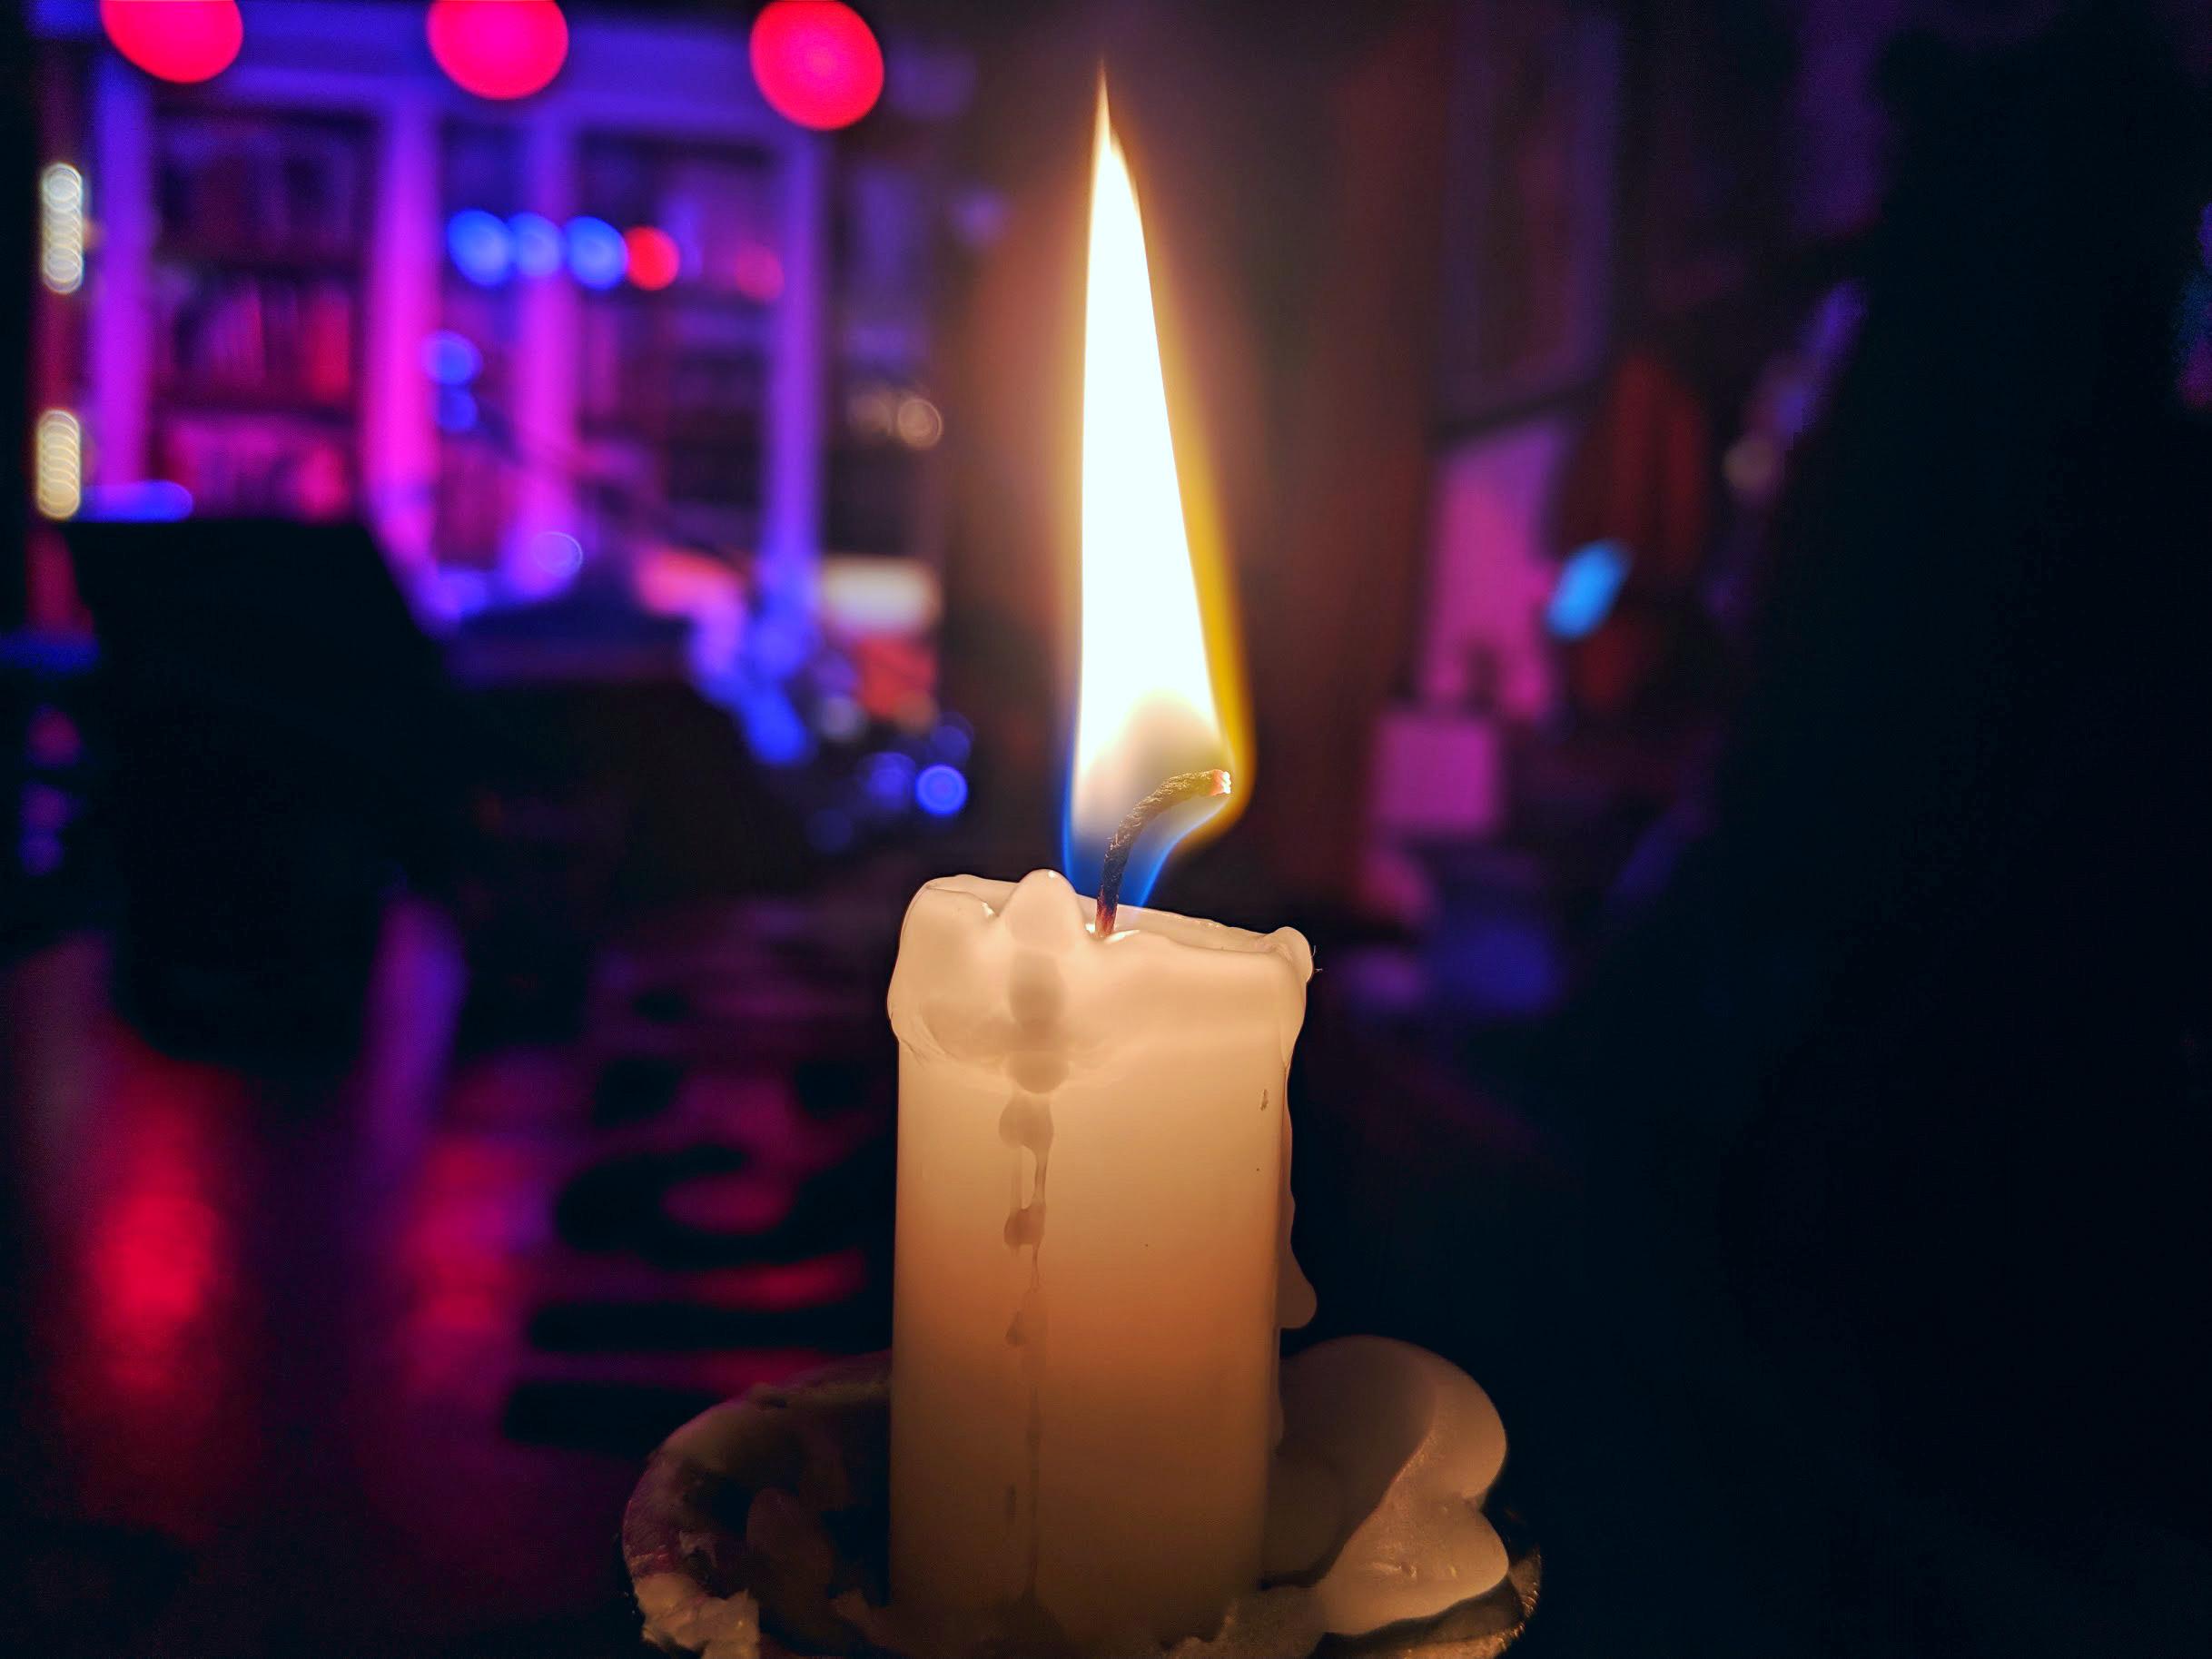 Pixel 3 candle shot